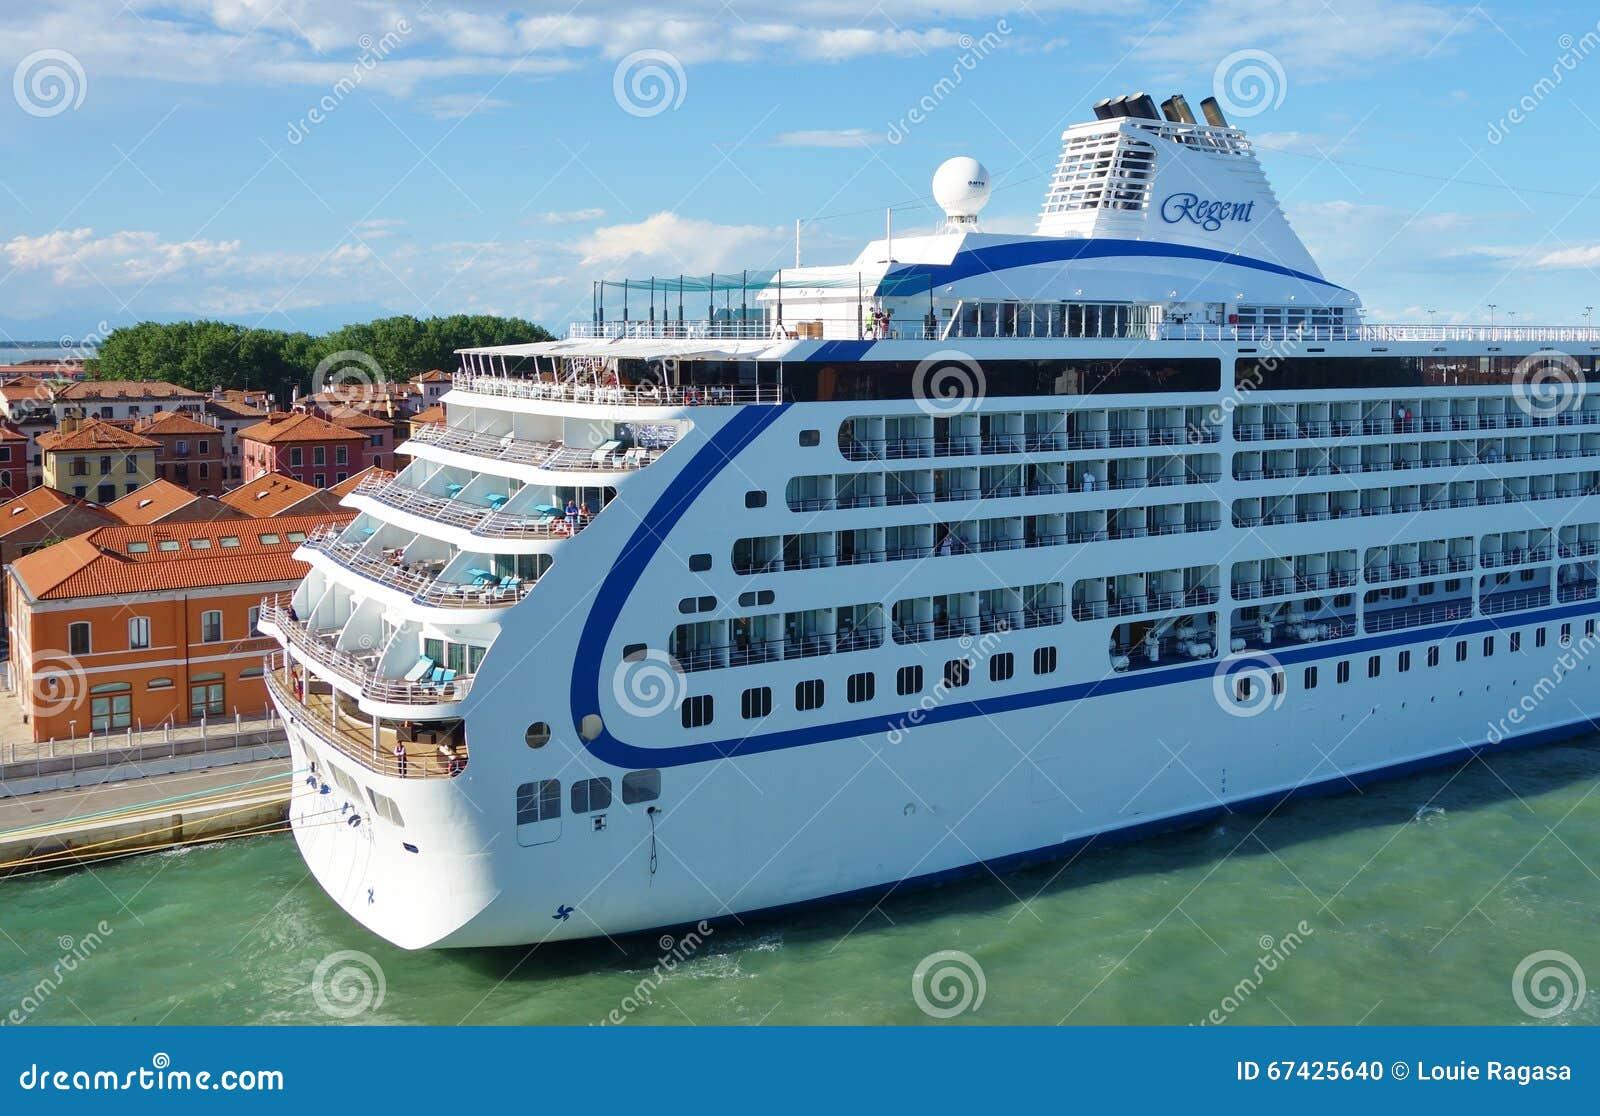 21 creative cruise ship port venice italy - Hotel venise port croisiere ...